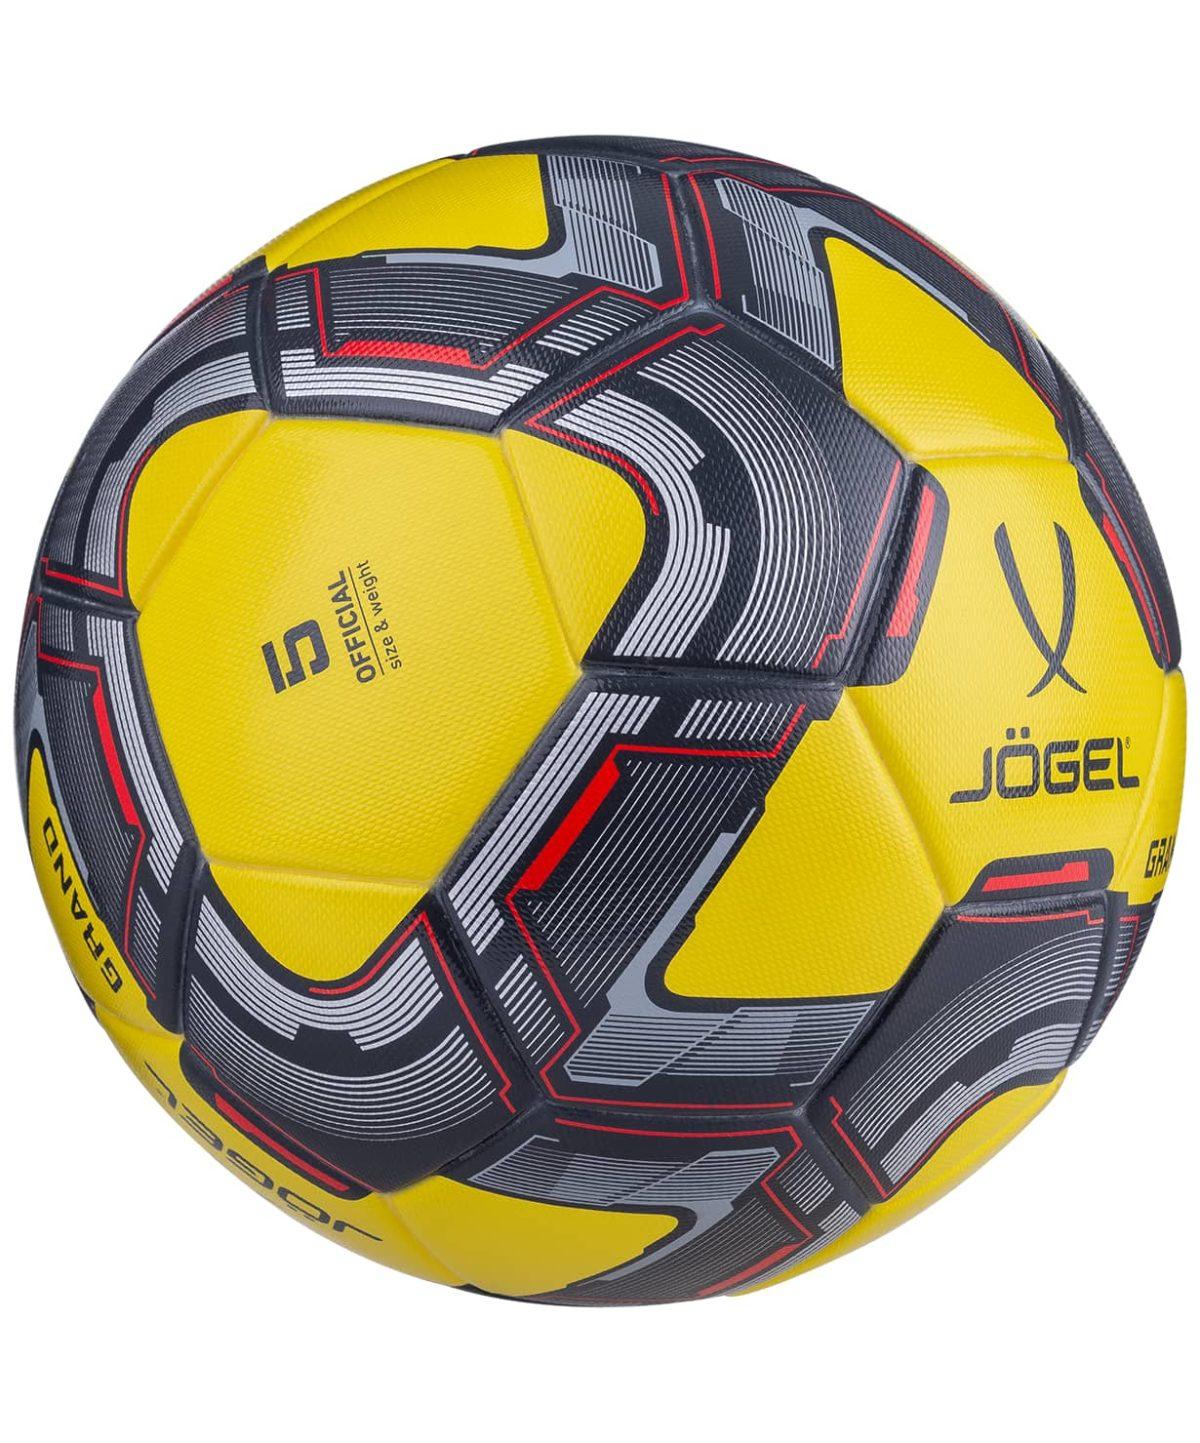 JOGEL Grand Мяч футбольный  Grand №5 (BC20) - 7